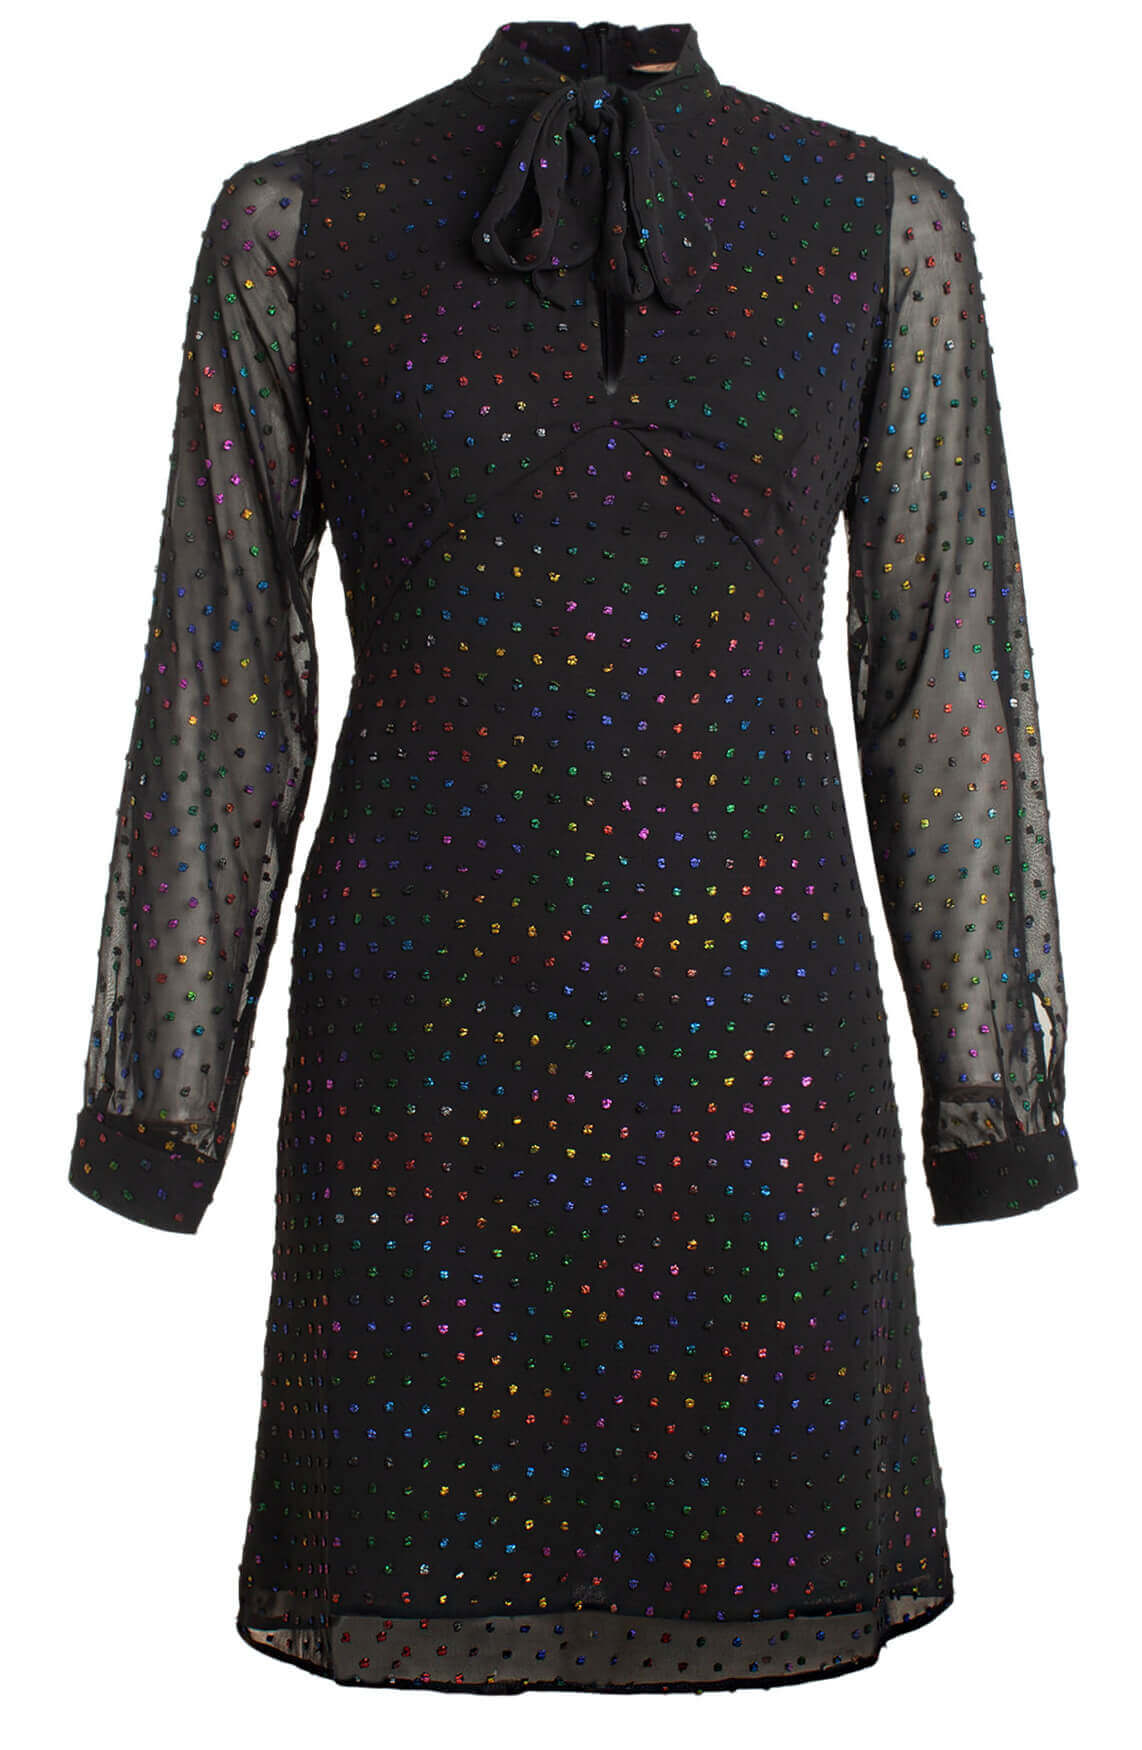 Kocca Dames Babylon jurk zwart